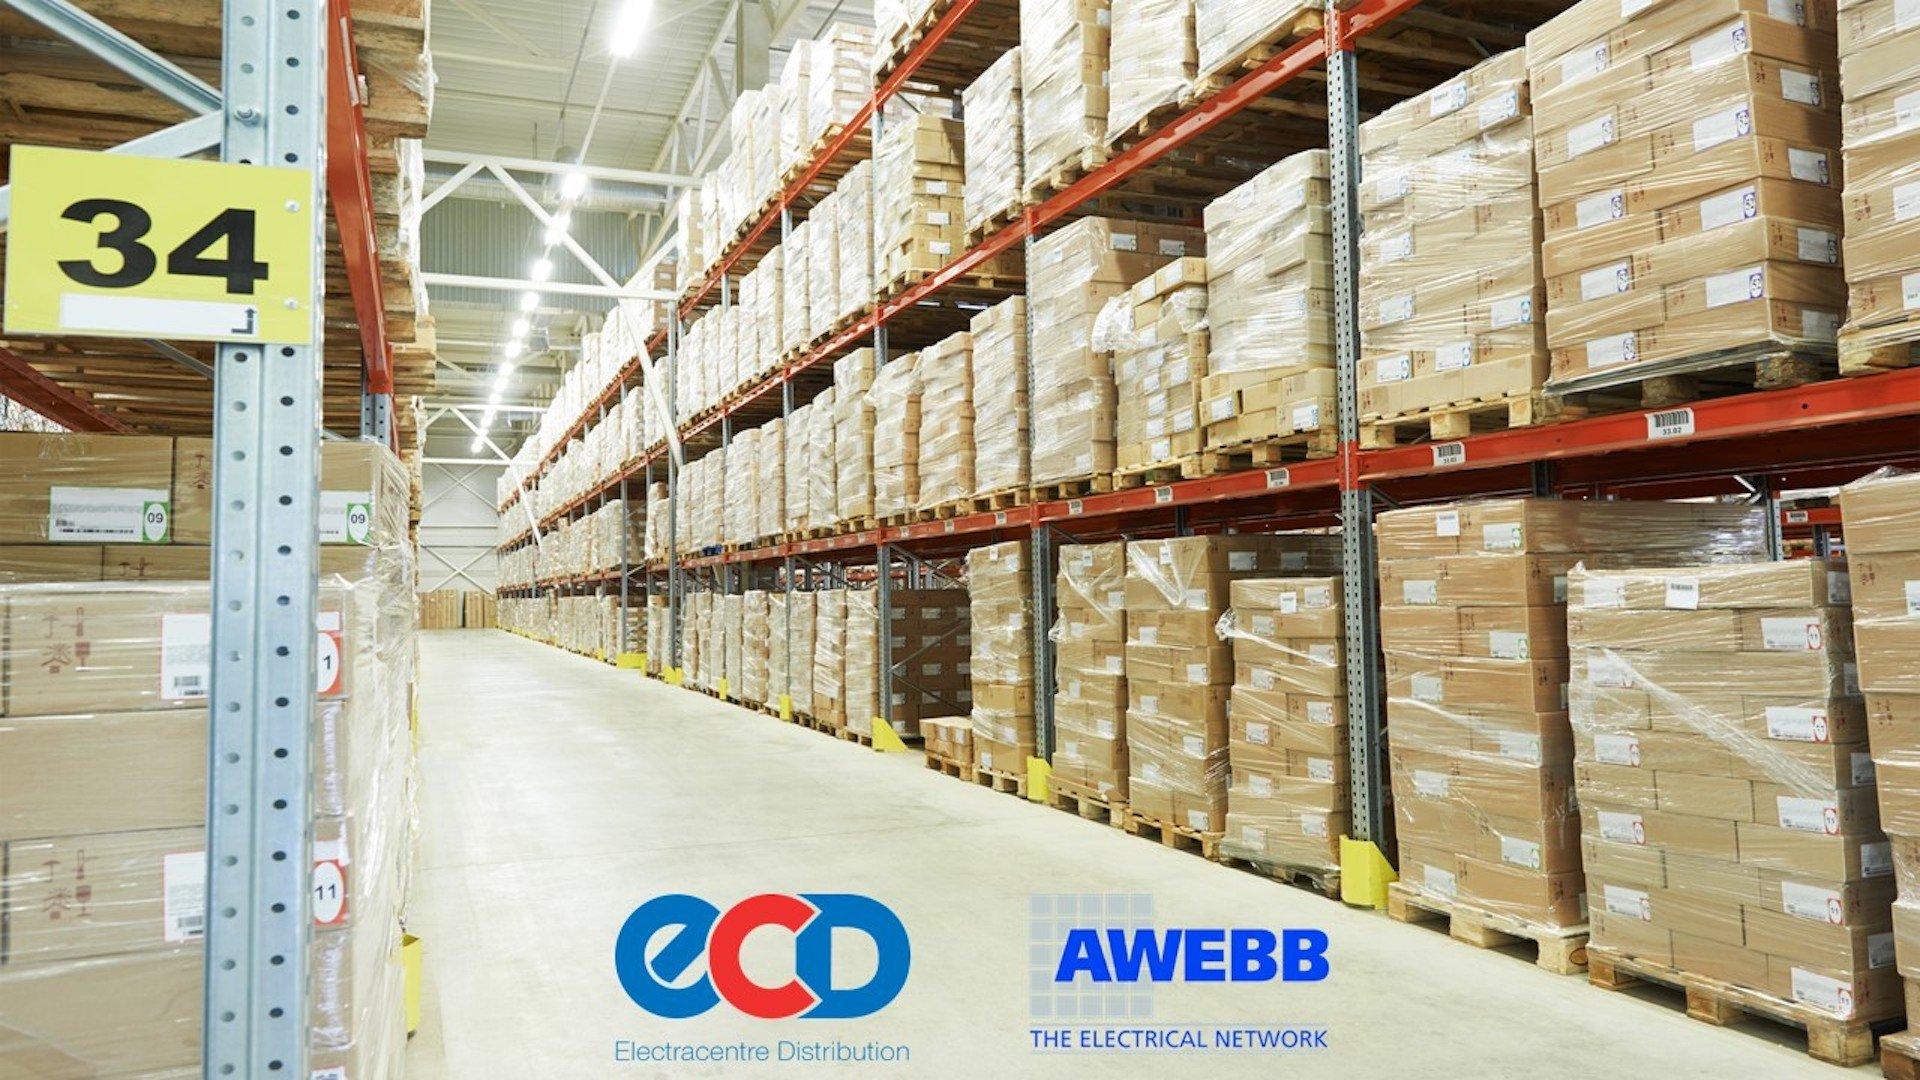 AWEBB Electrcentre Warehouse